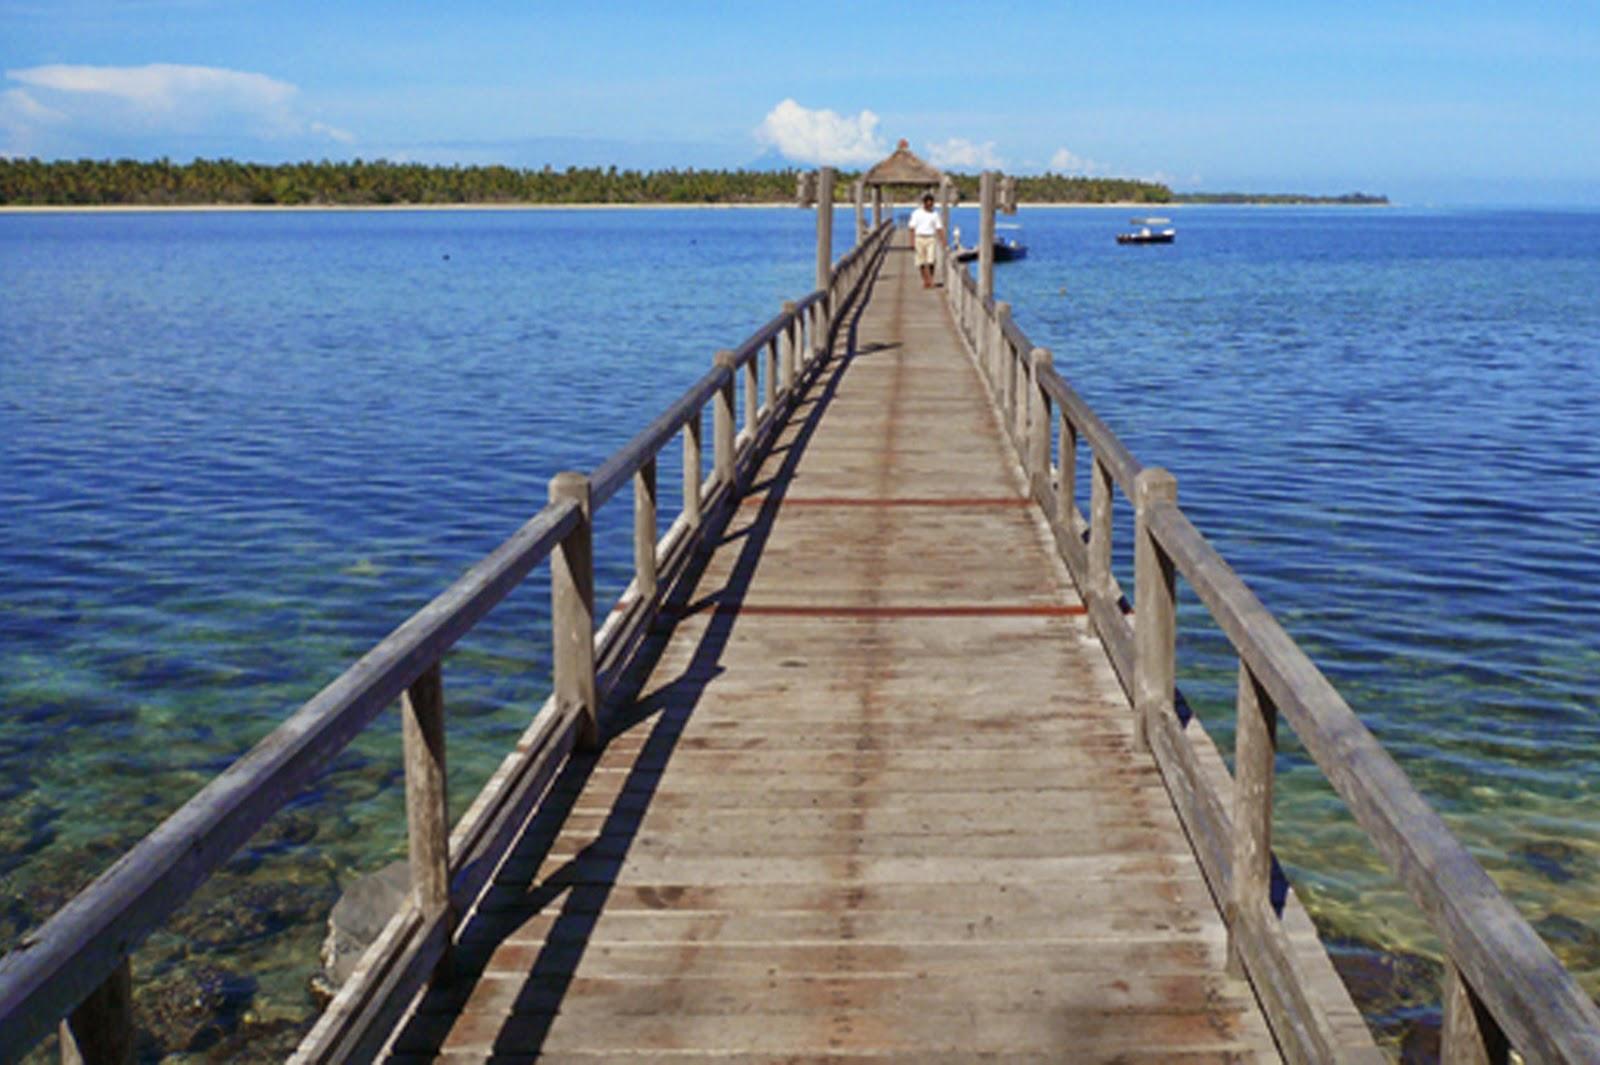 Pantai Sire Medana Kabupaten Lombok Utara 7og4nk Kab